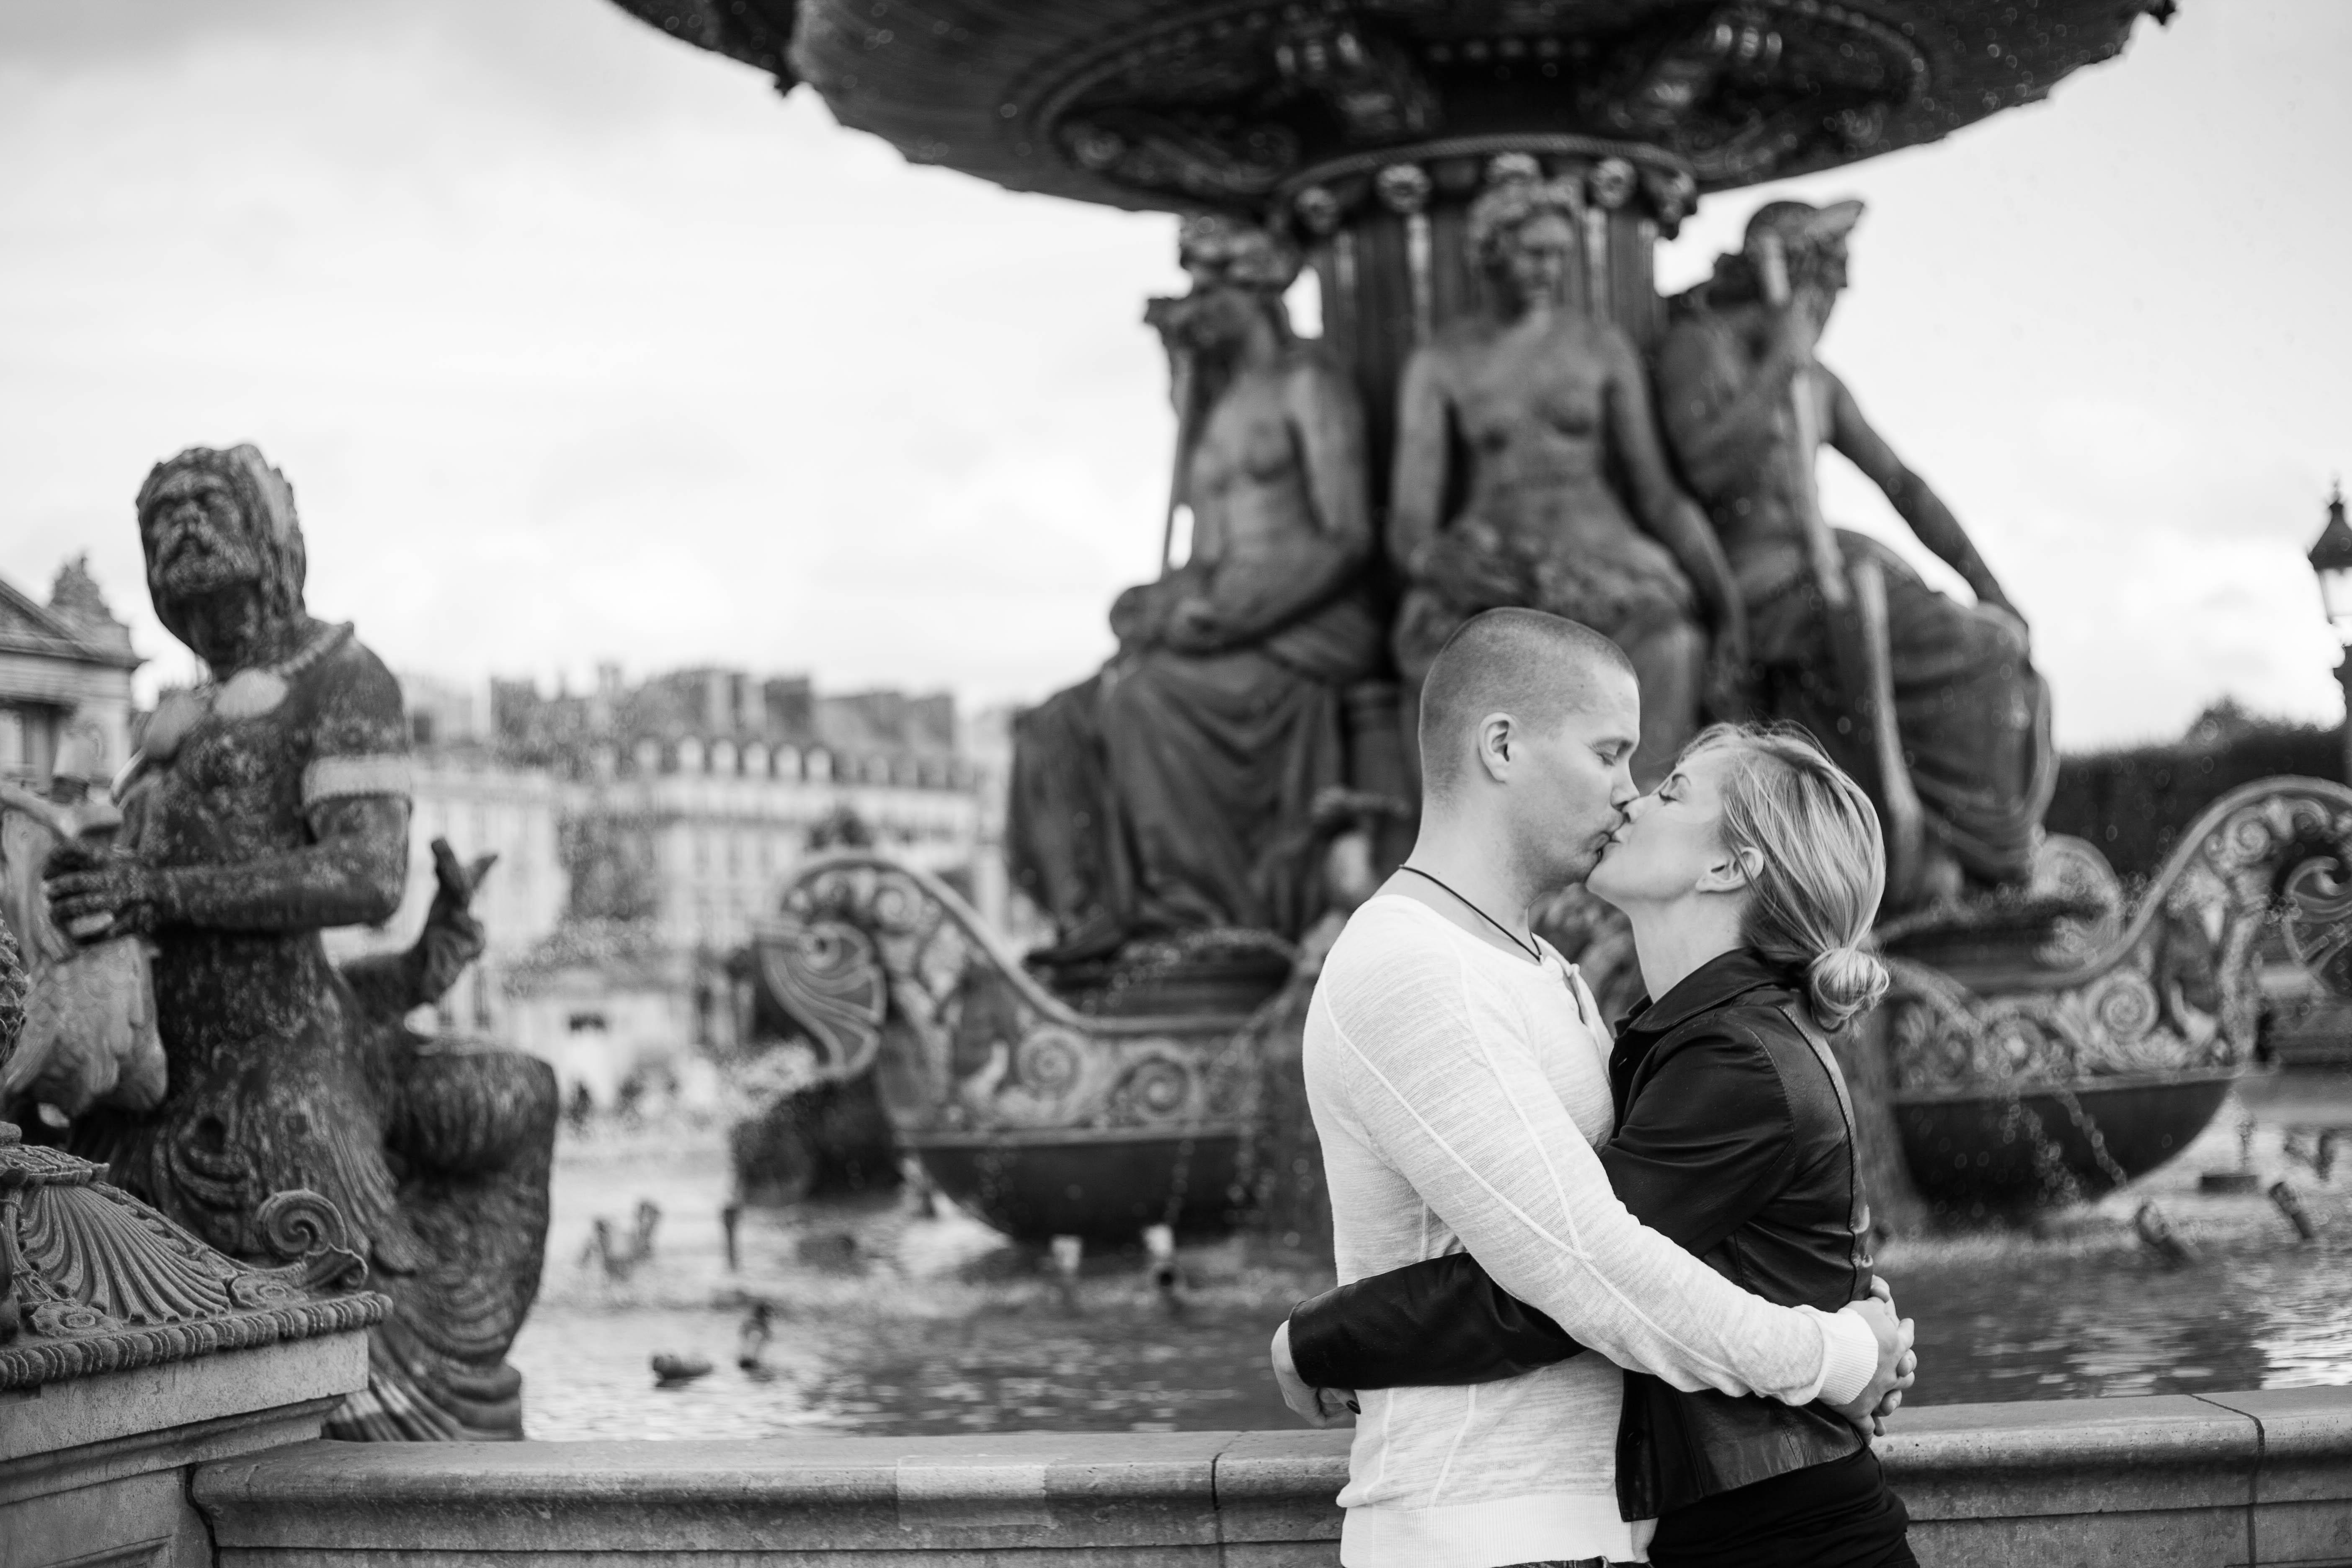 Lovers in Paris, Conconde